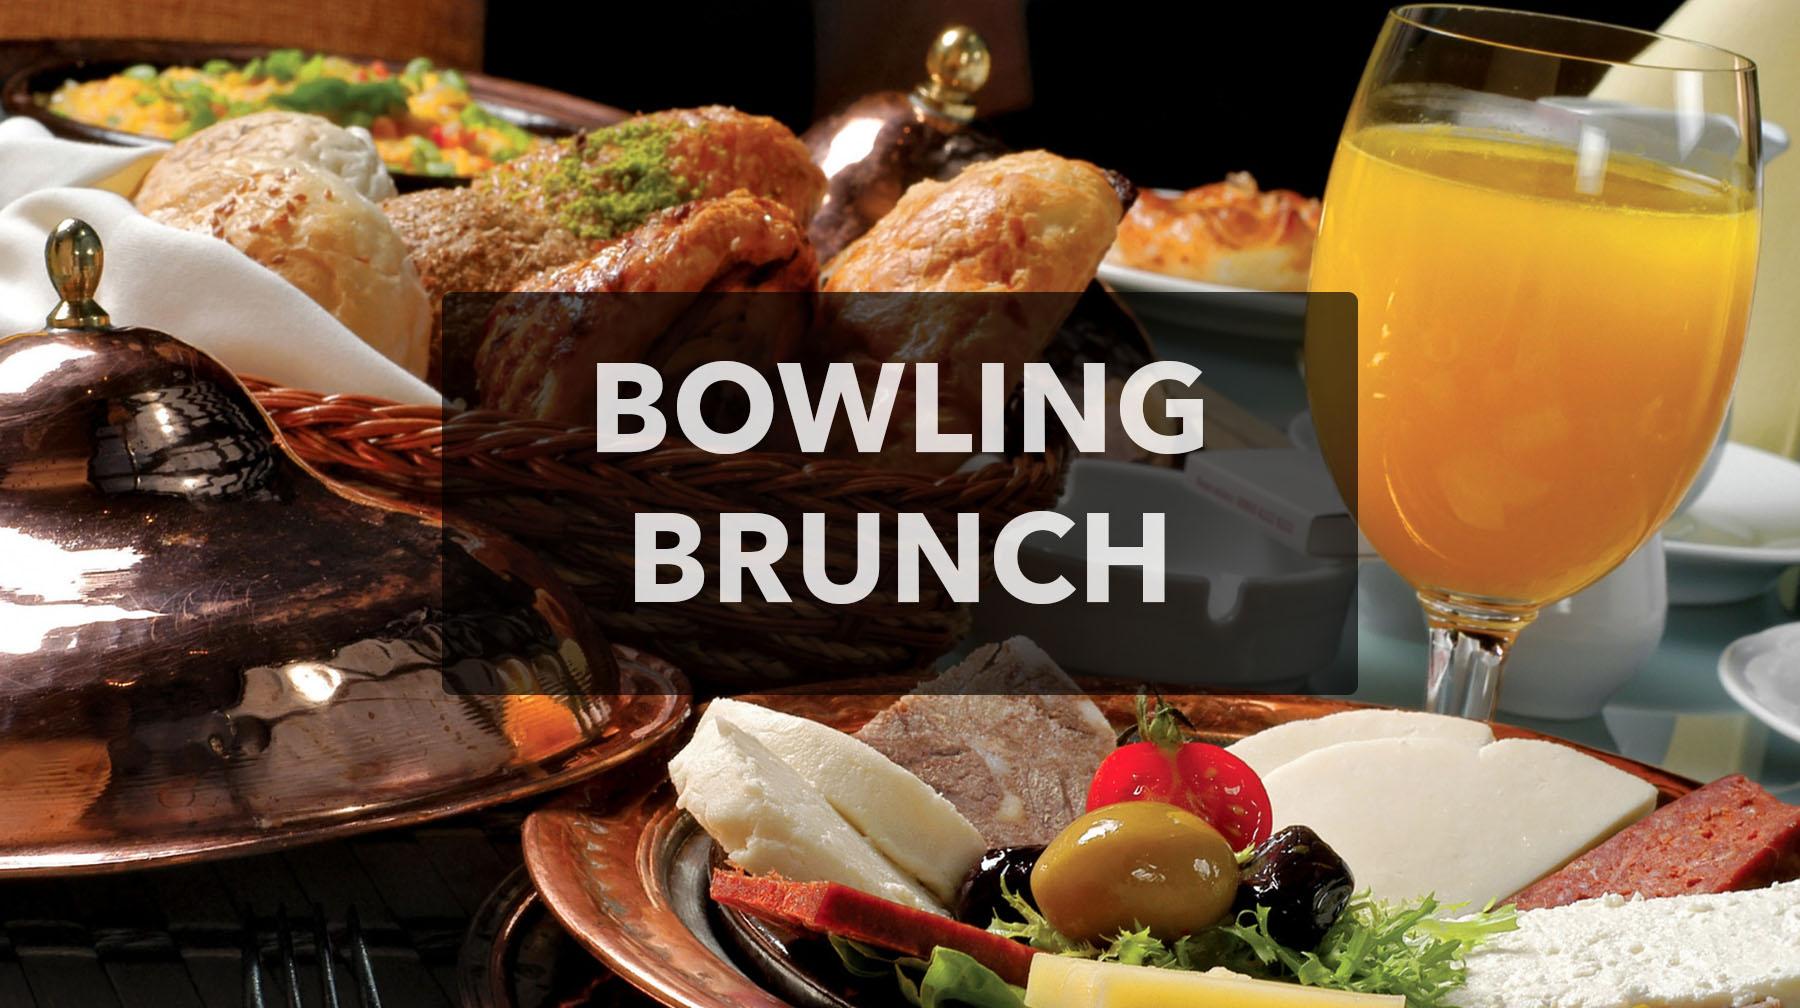 Bowling Strausberg, Bowlingtower, Strausberg Nord, Brunch, Catering, Buffet, Schwarzlicht Bowlen, Brandenburg, Feiern,